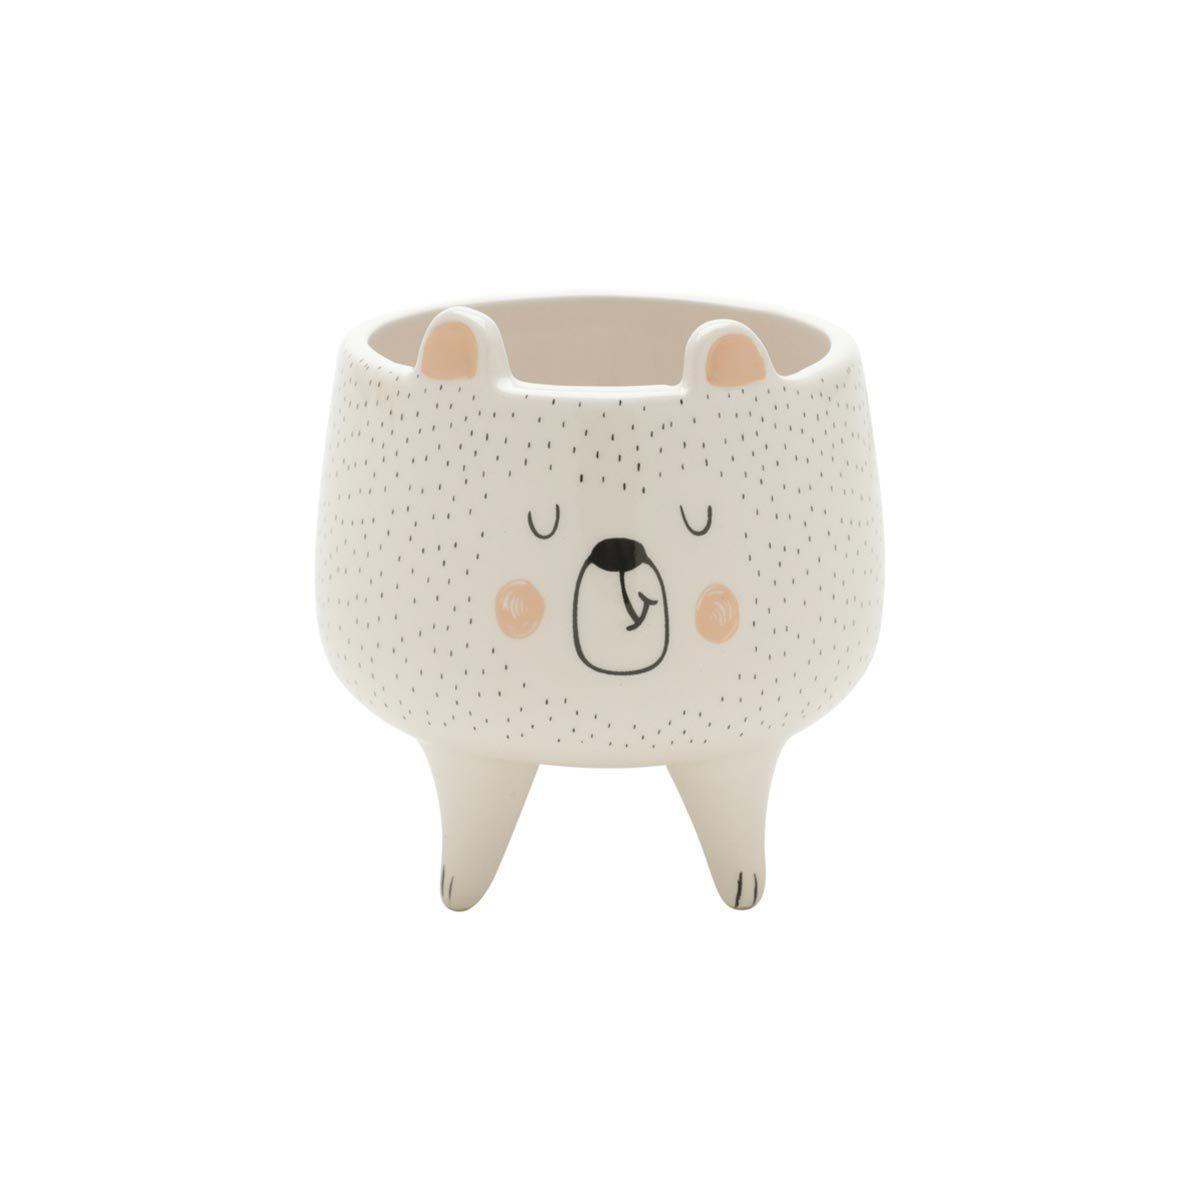 Cachepot Vaso Decorativo de Cerâmica Urso Sleeping Bear